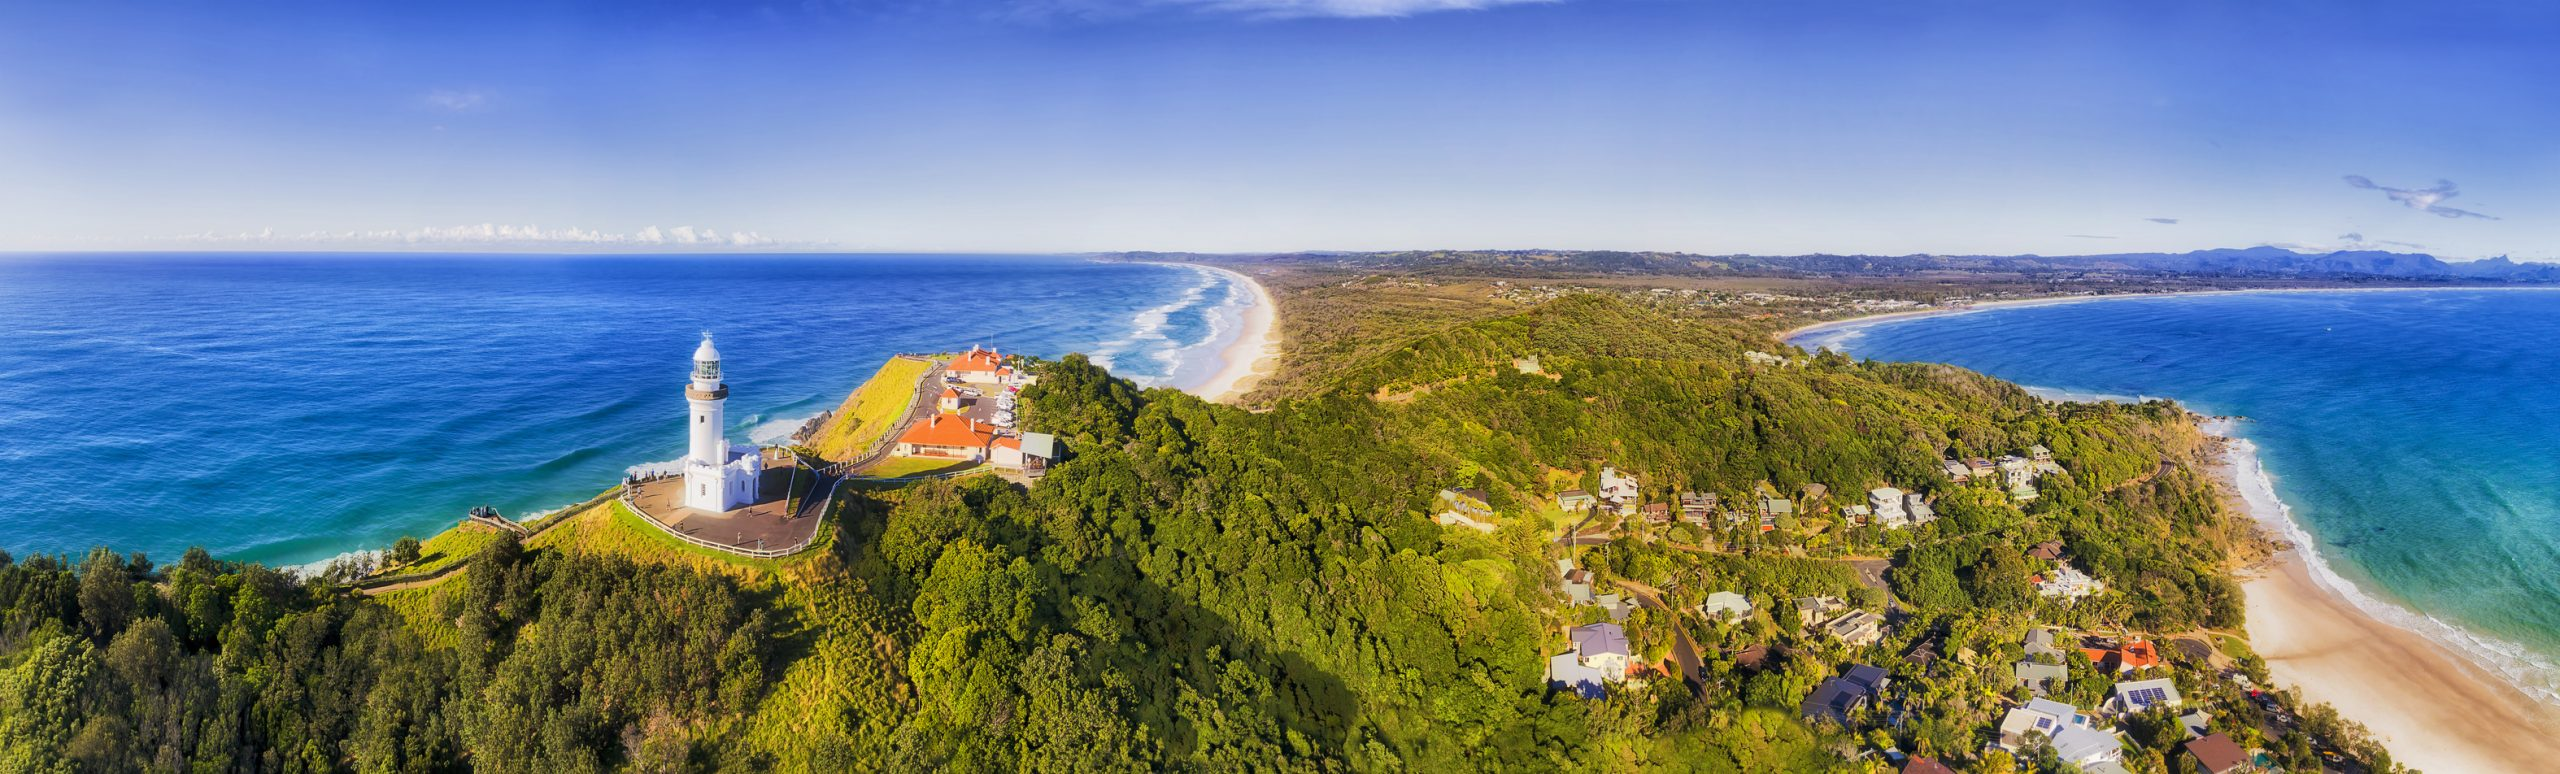 Byron Bay i Australien